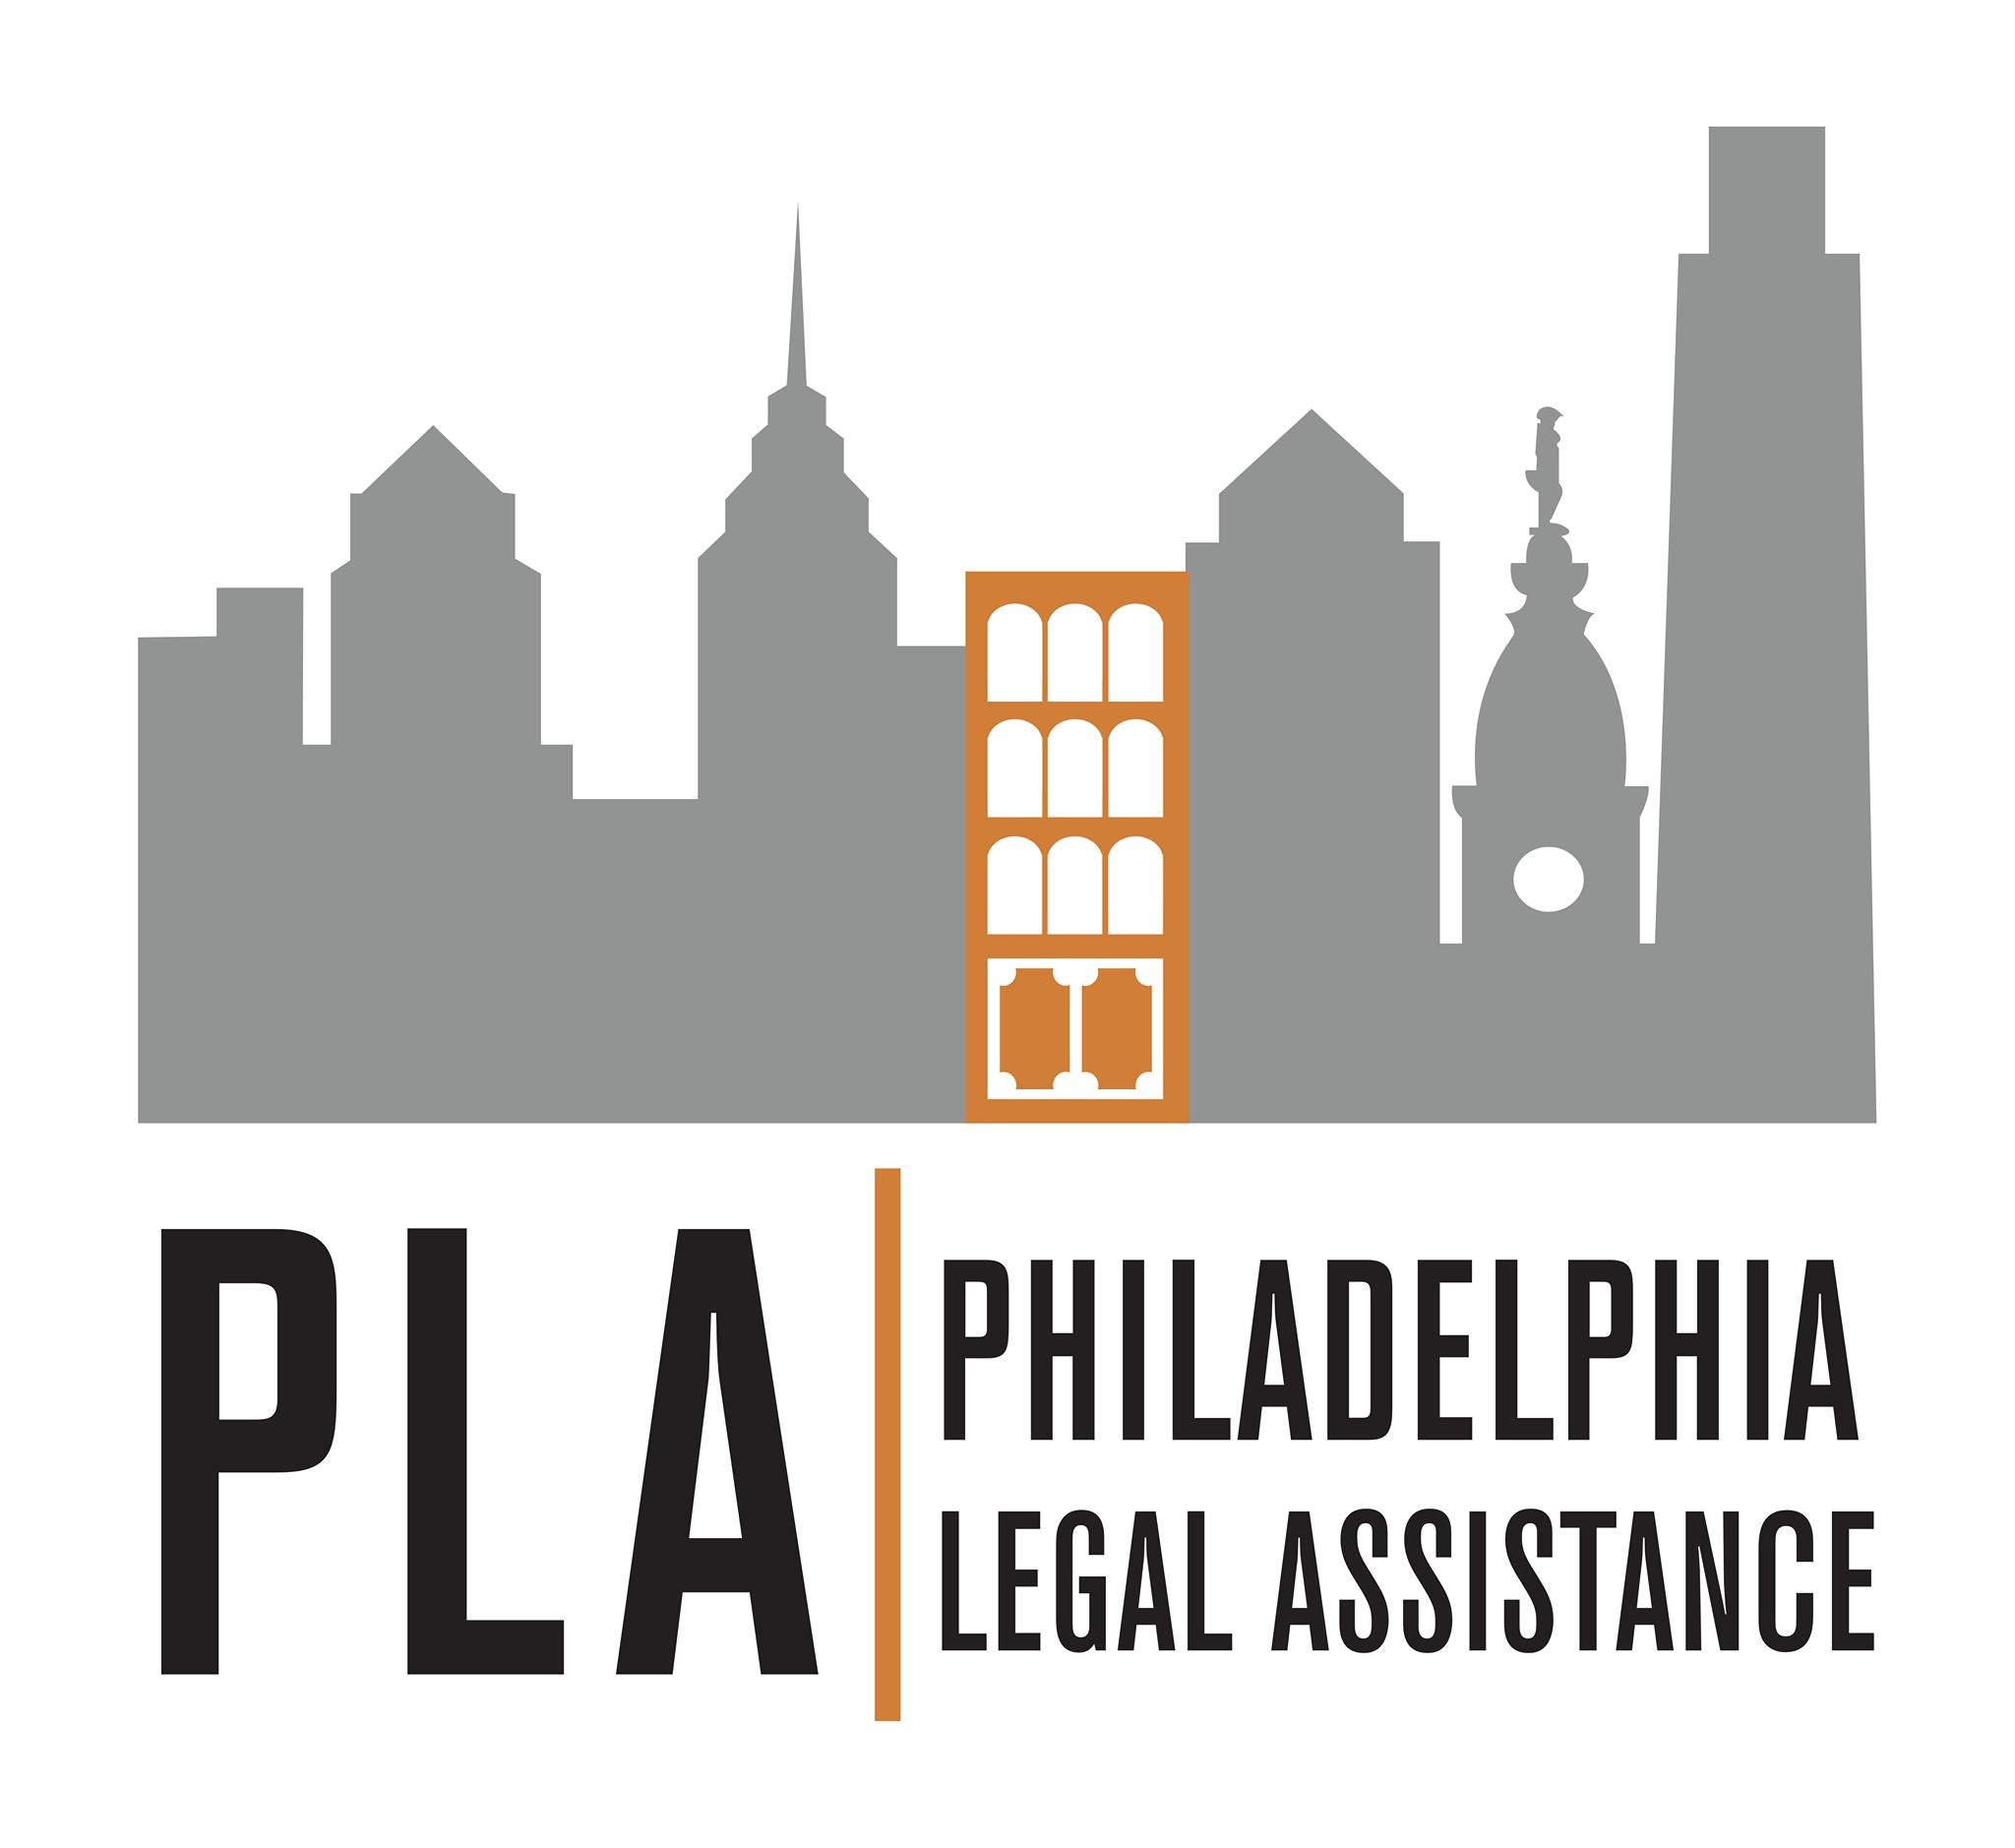 philadelphialegalassistancelogo.png